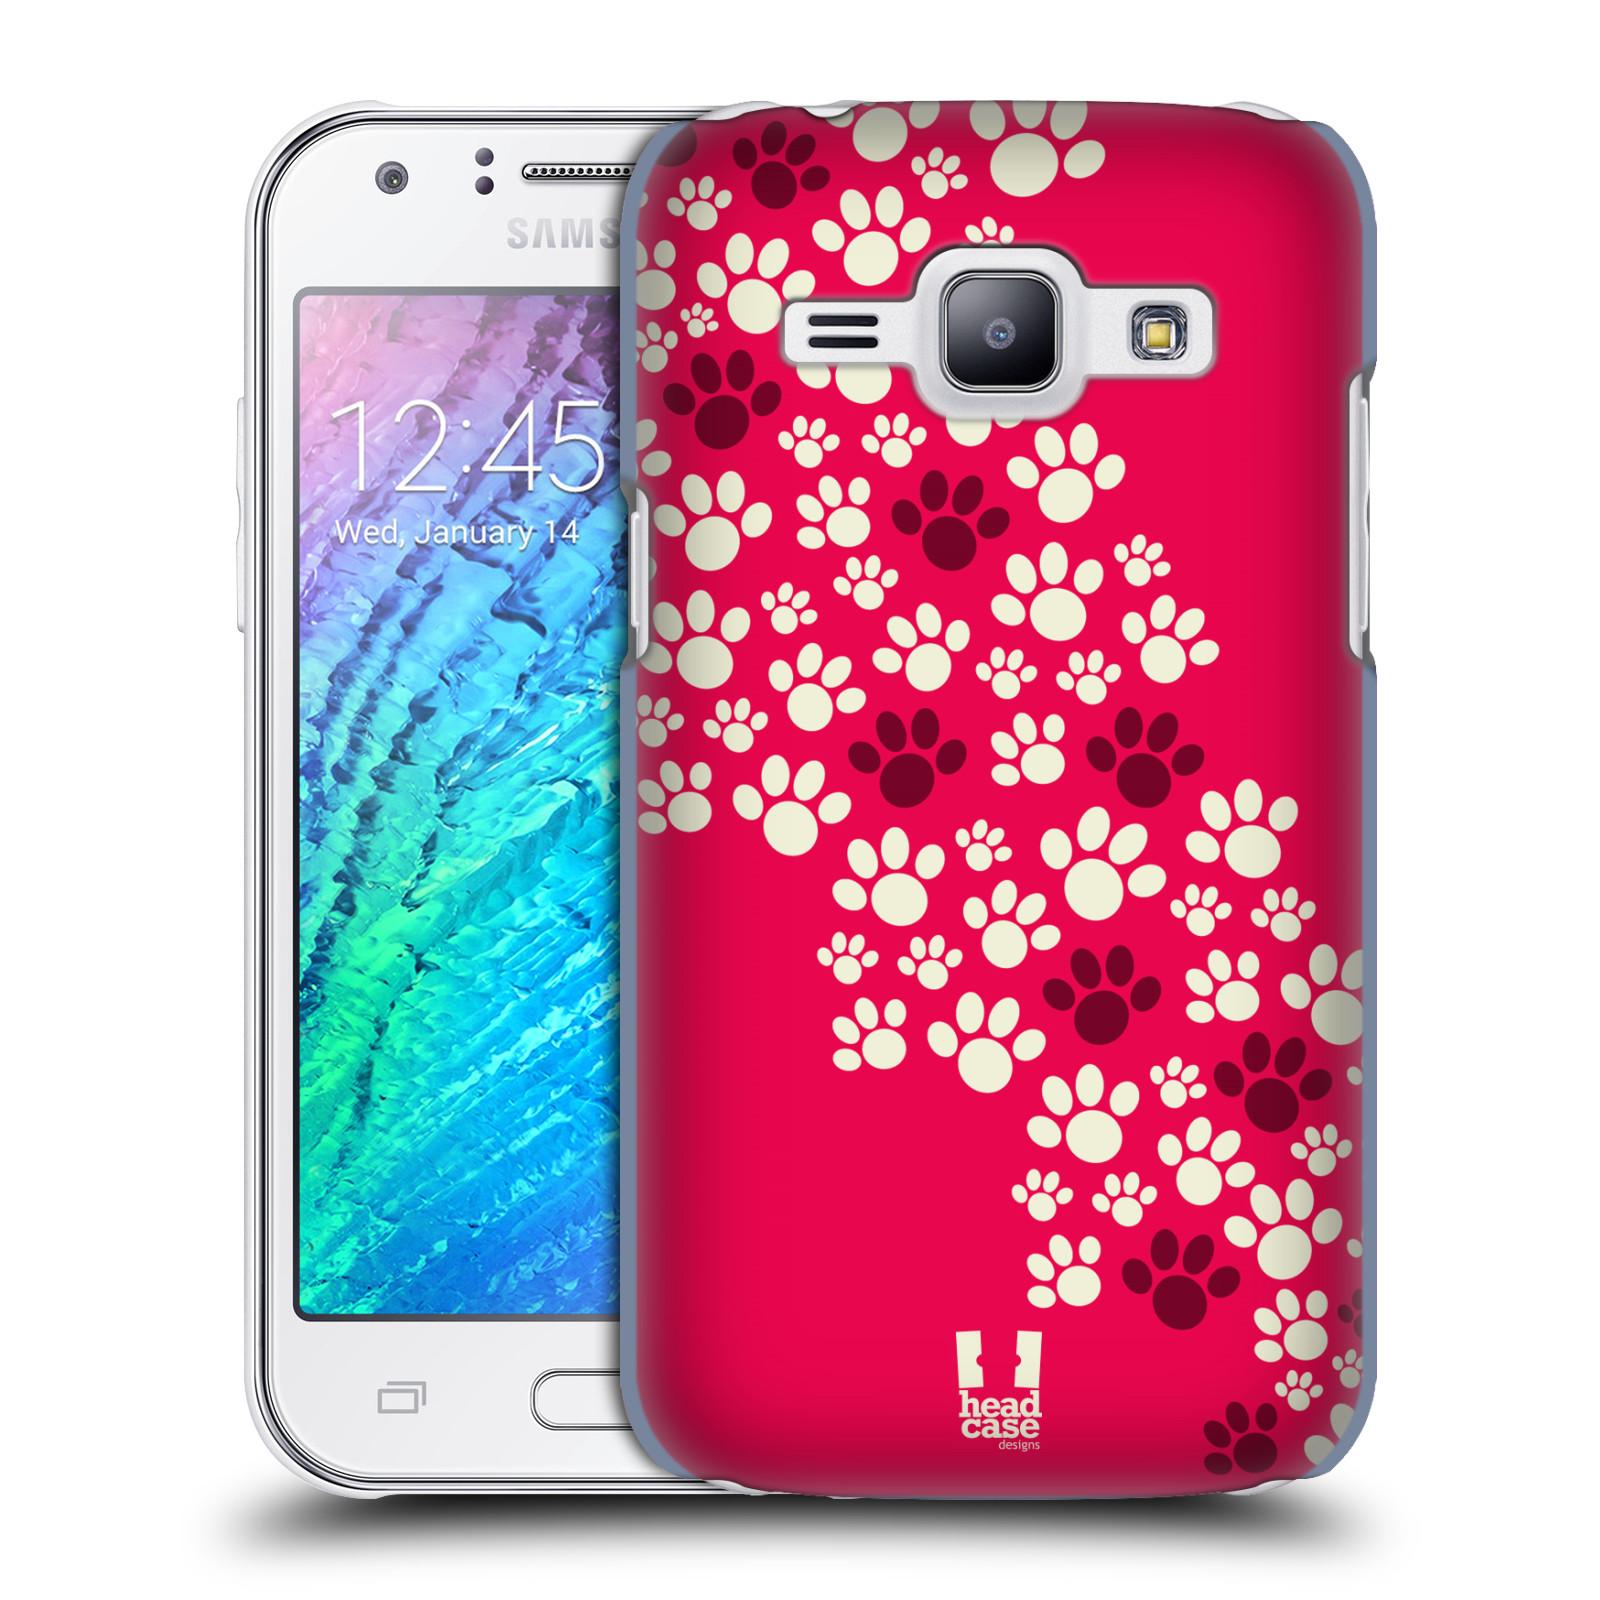 Plastové pouzdro na mobil Samsung Galaxy J1 HEAD CASE TLAPKY RŮŽOVÉ (Kryt či obal na mobilní telefon Samsung Galaxy J1 a J1 Duos )